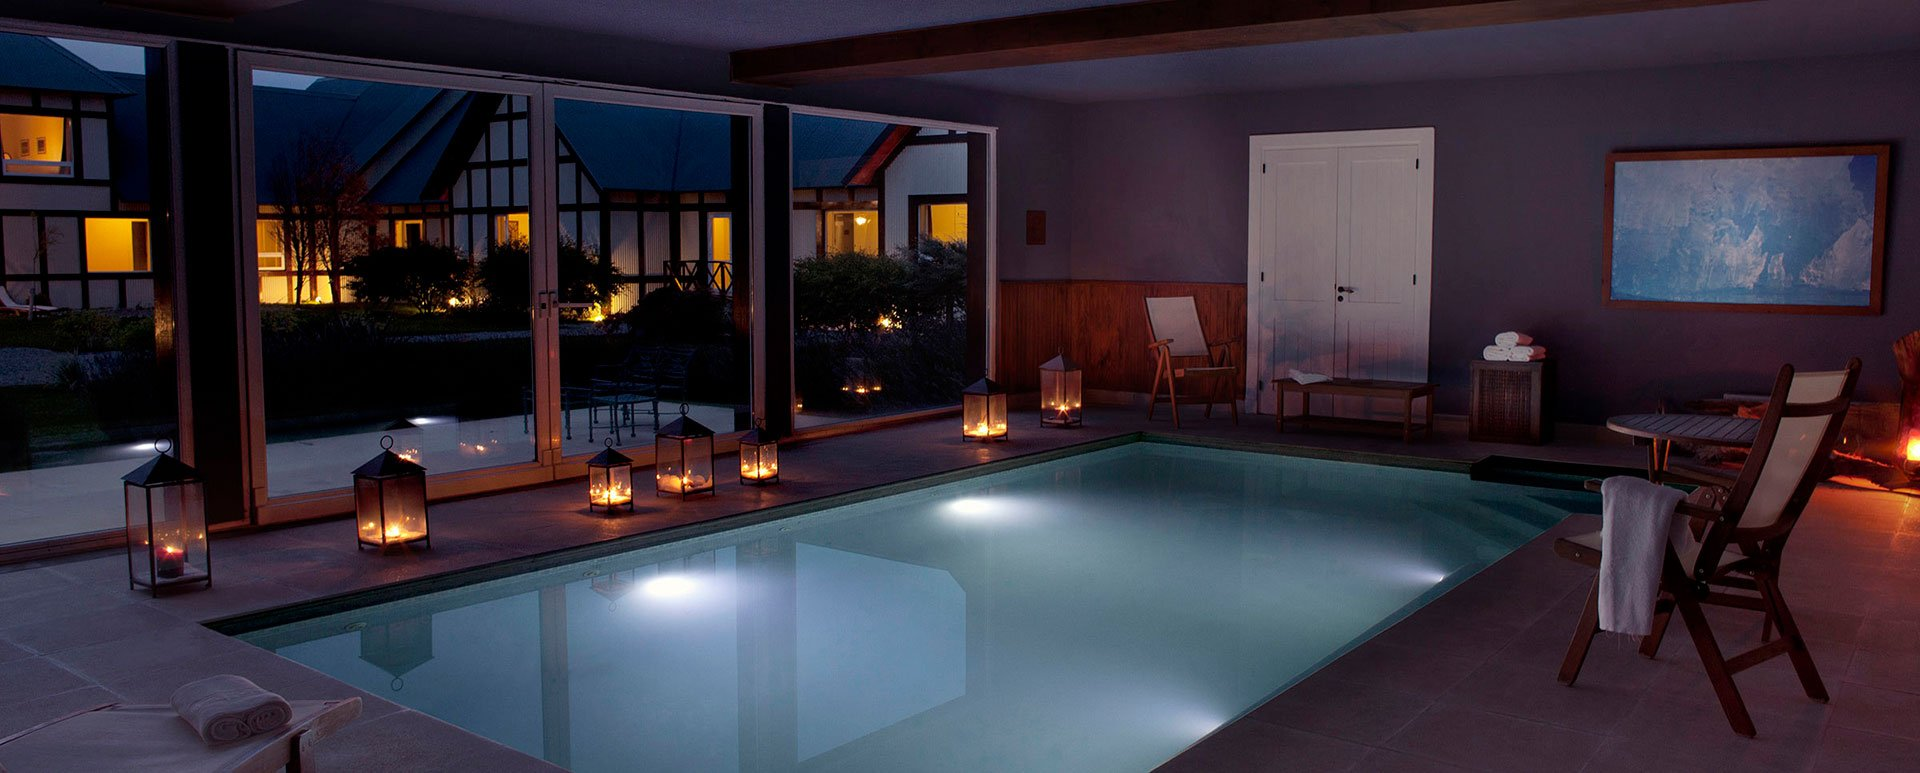 Eolo Patagonia Hotel pool